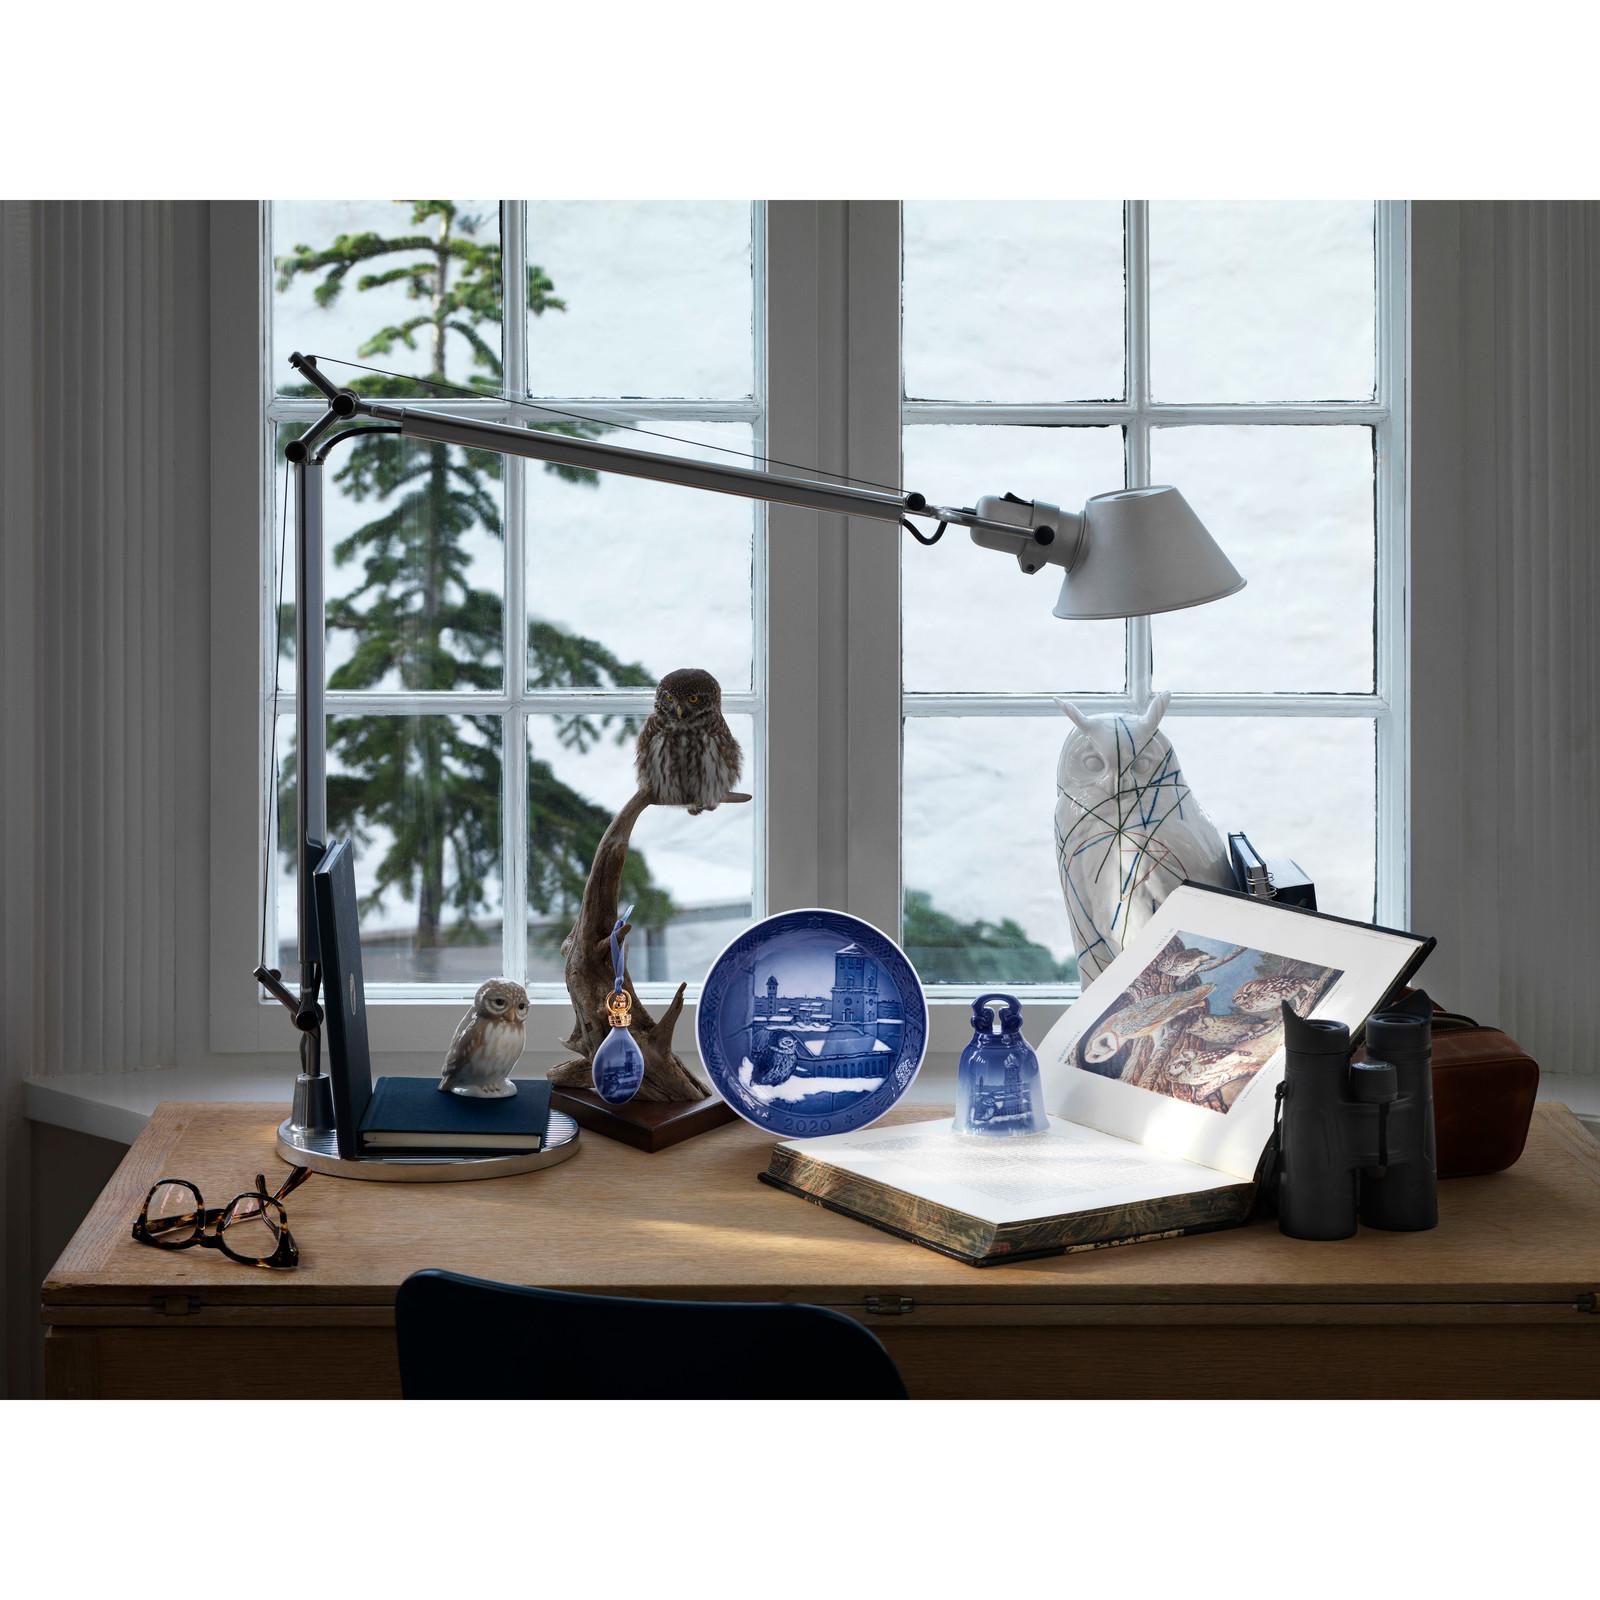 2020 Royal Copenhagen Annual Figurine (1051100)